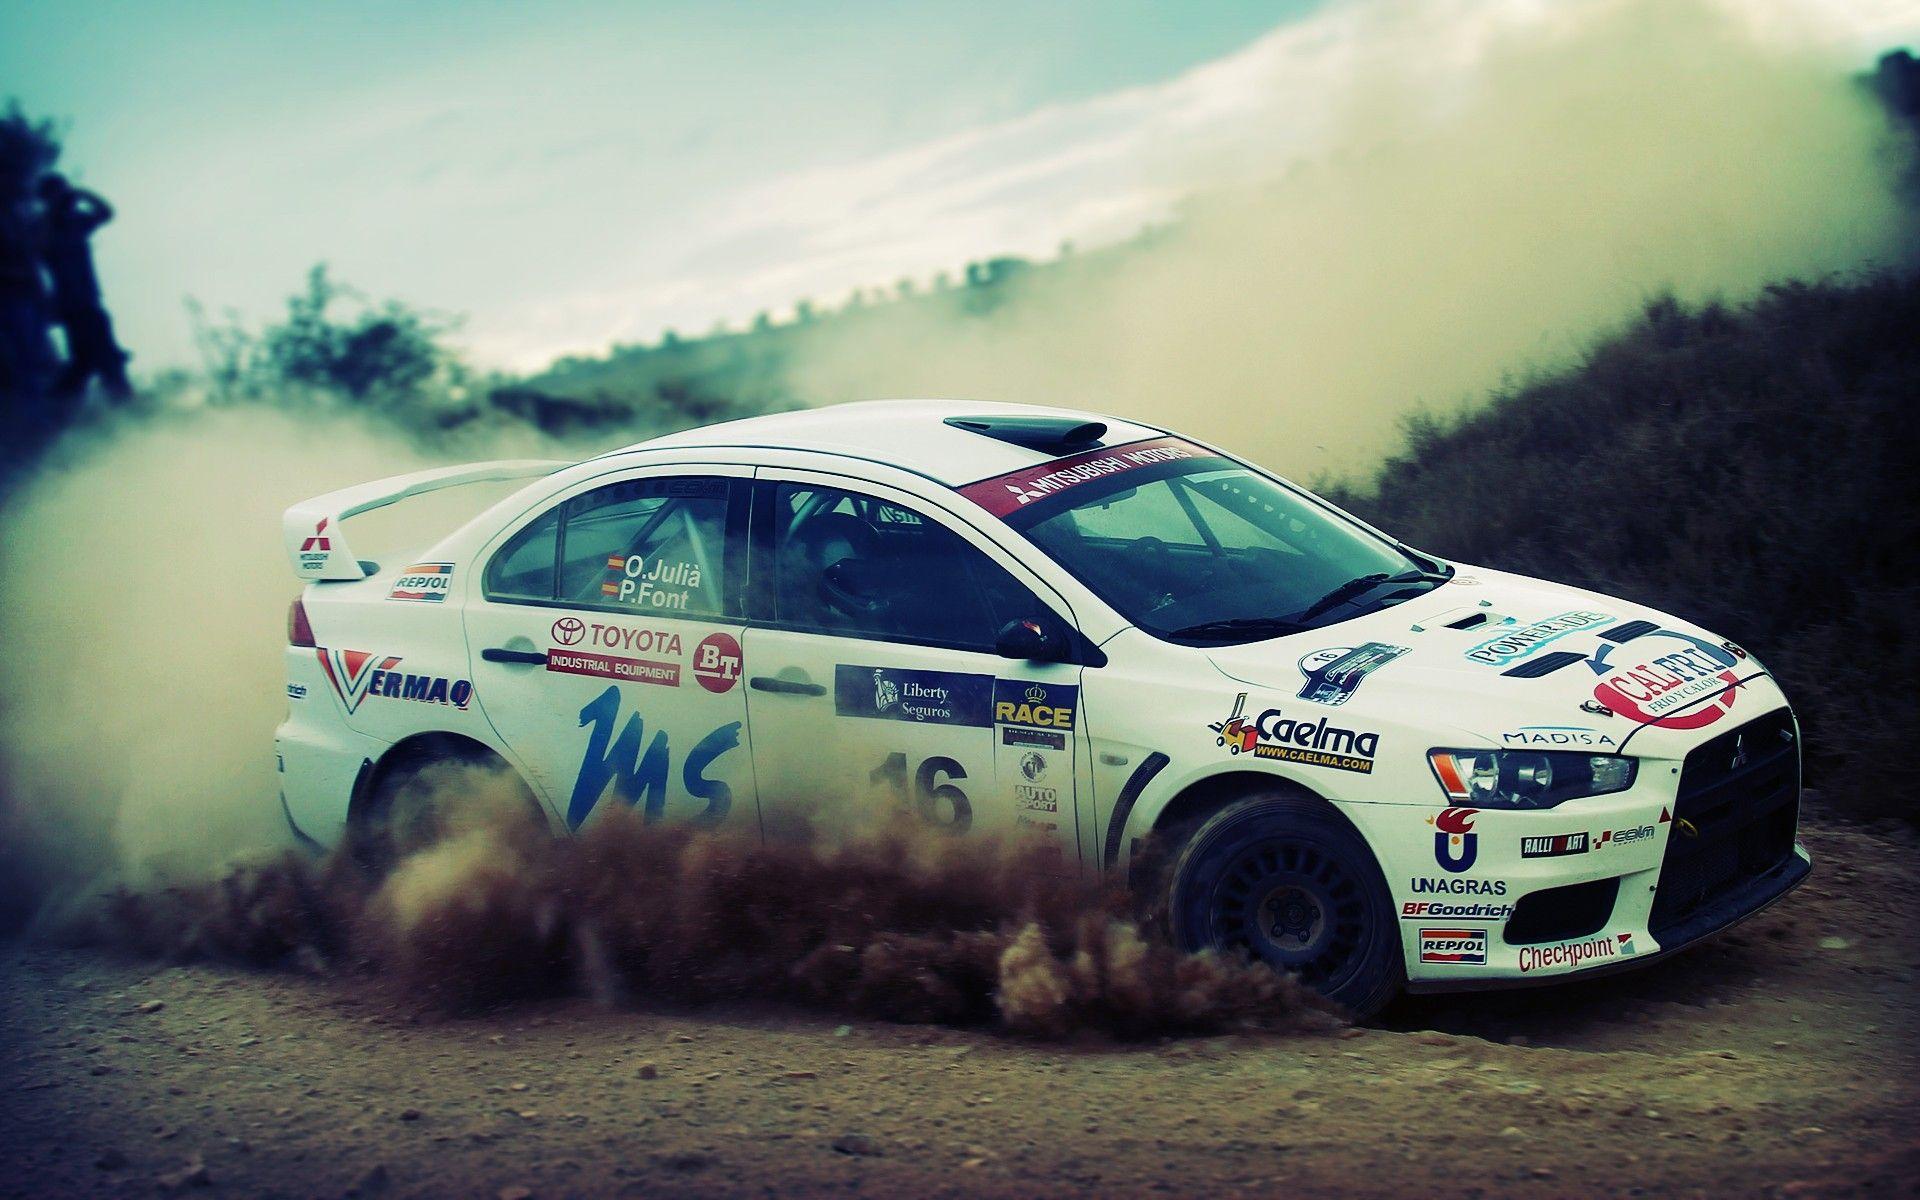 Pin by zajawka on dust | Pinterest | Mitsubishi lancer, Rally car ...